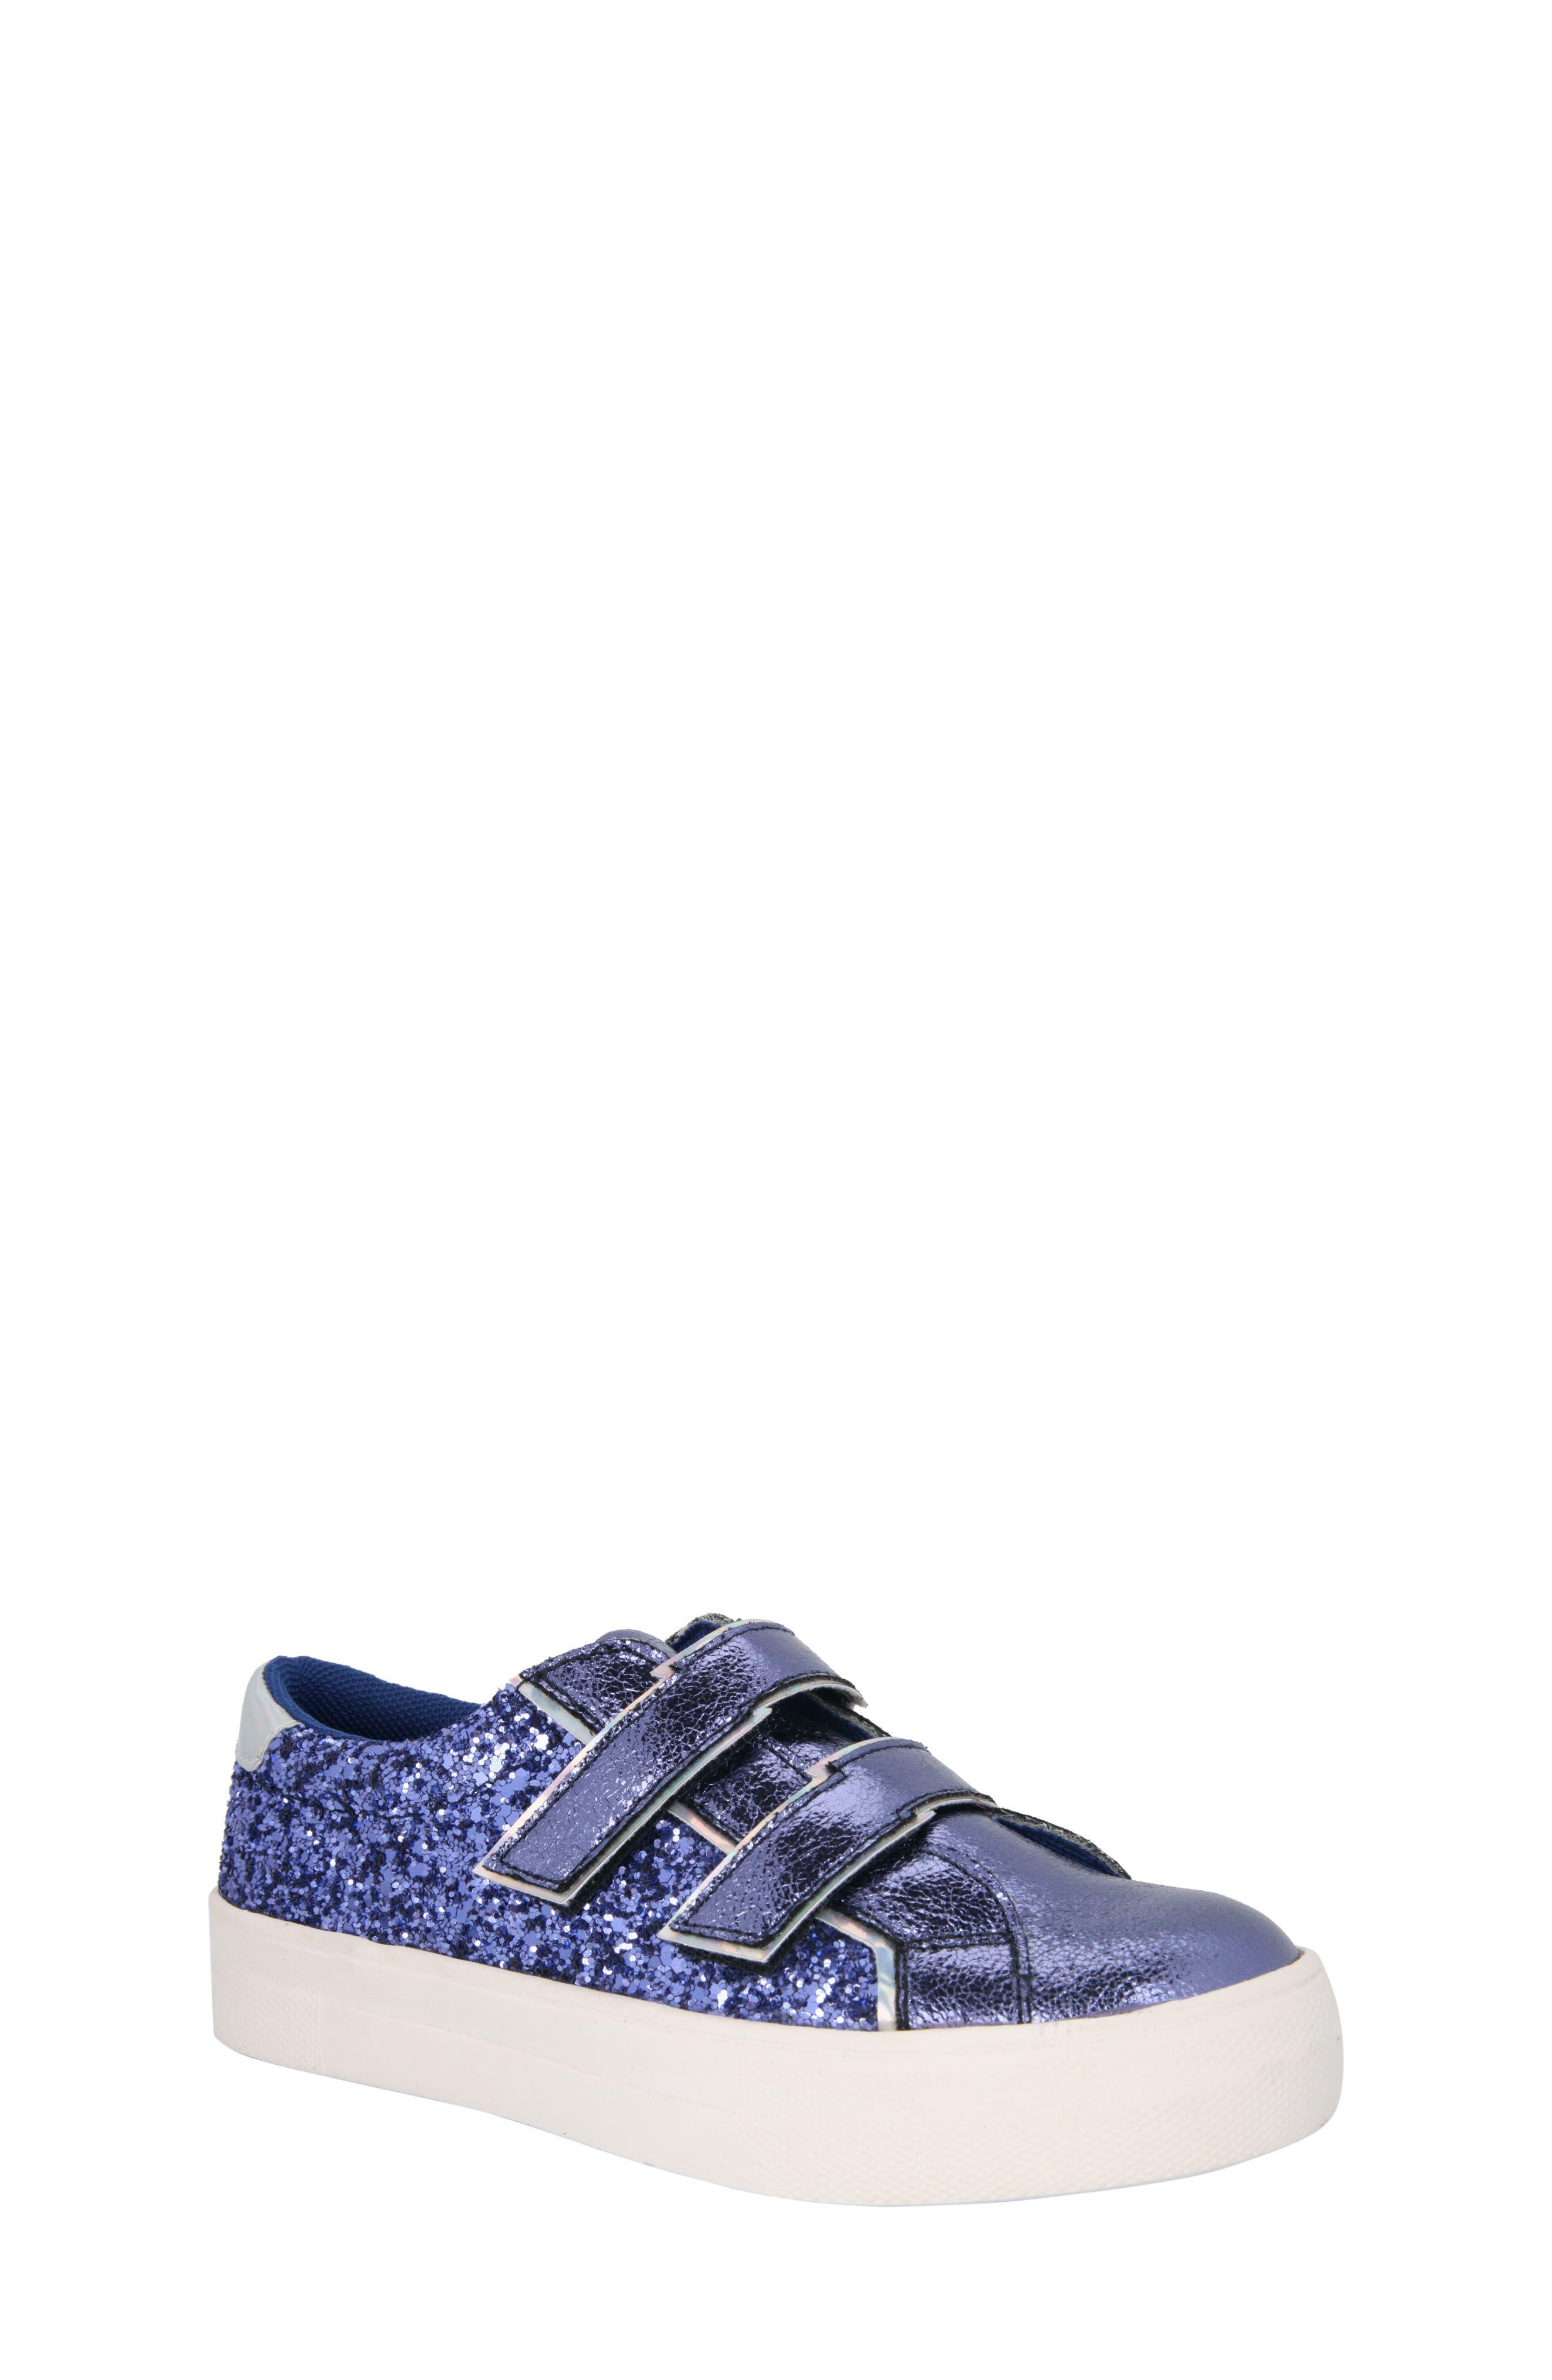 Ashley Glittery Metallic Sneaker,                         Main,                         color, Cobalt Metallic/ Glitter